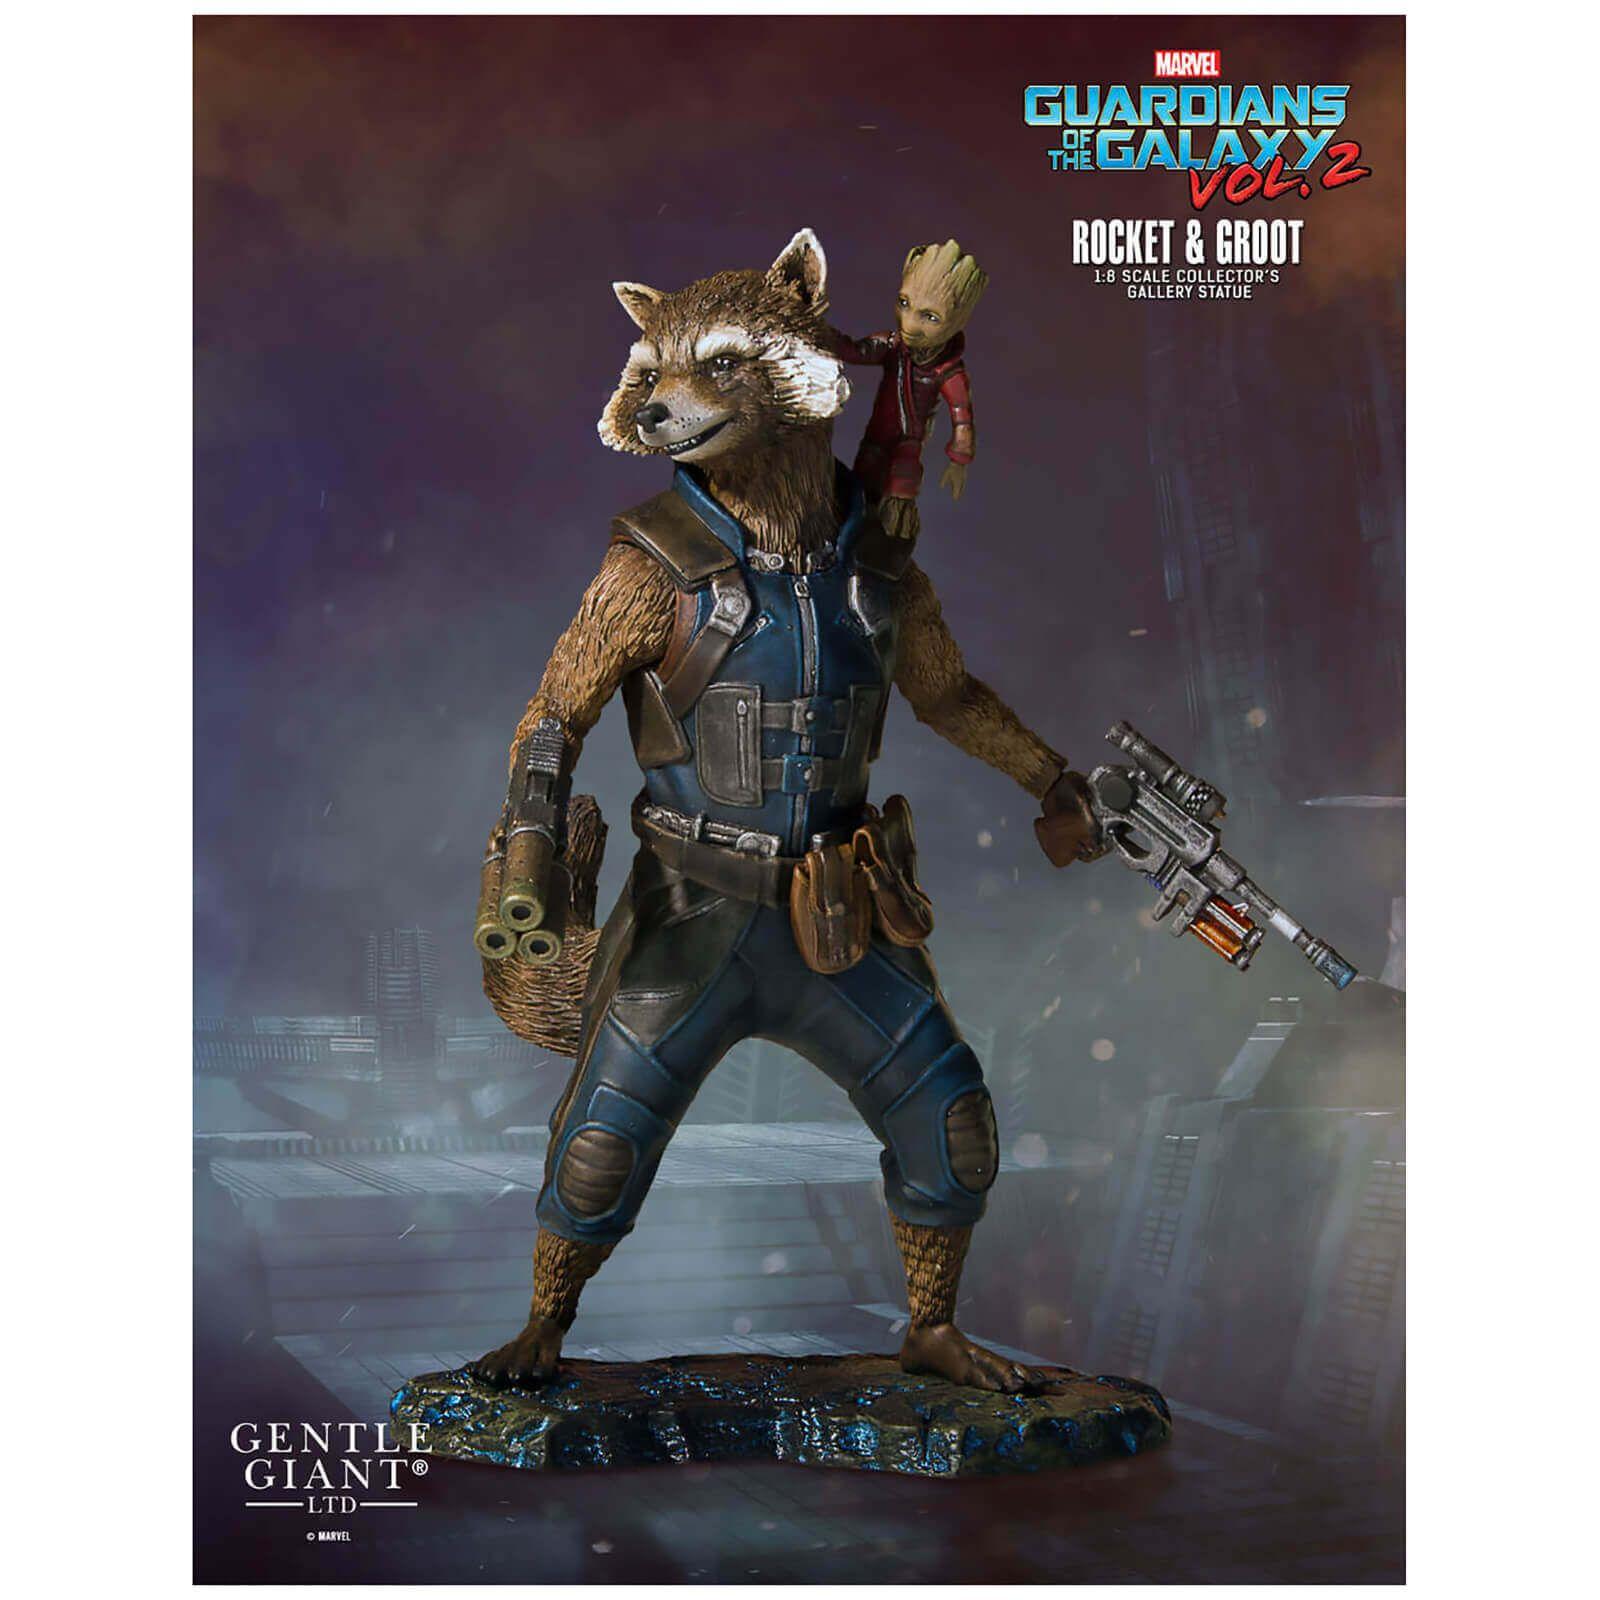 Statuette Rocket & Groot des Gardiens de la Galaxie2 de Marvel, Collectors Gallery– Gentle Giant échelle 1:8 (11cm)